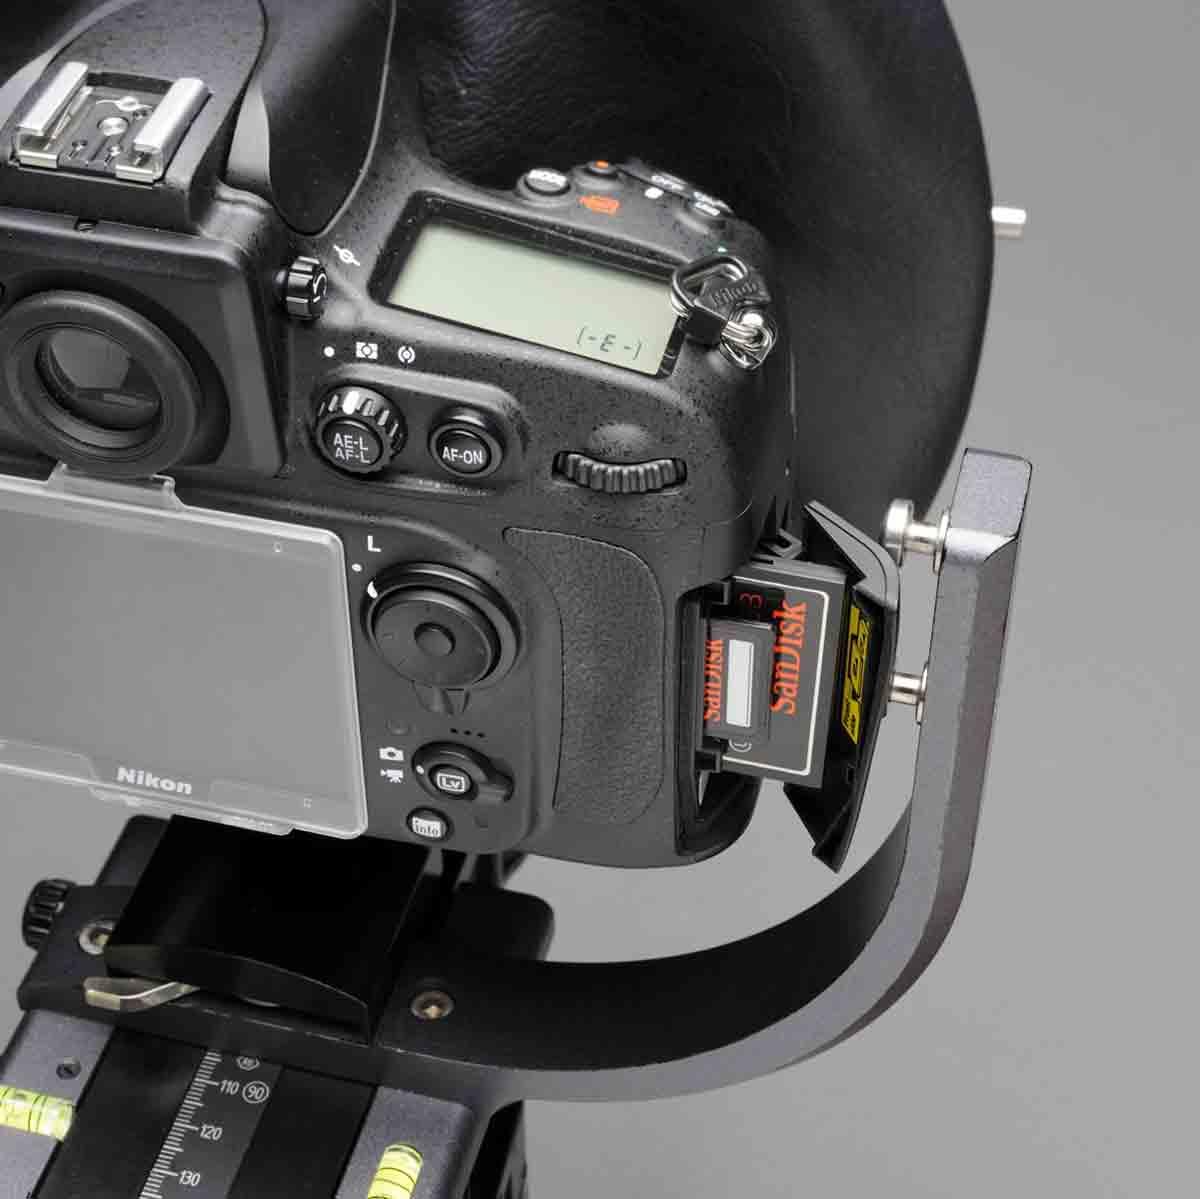 Nikon-D800-Cambo-X2-Pro-Schneider-Kreuznach-APO-90mm-f4.5-16